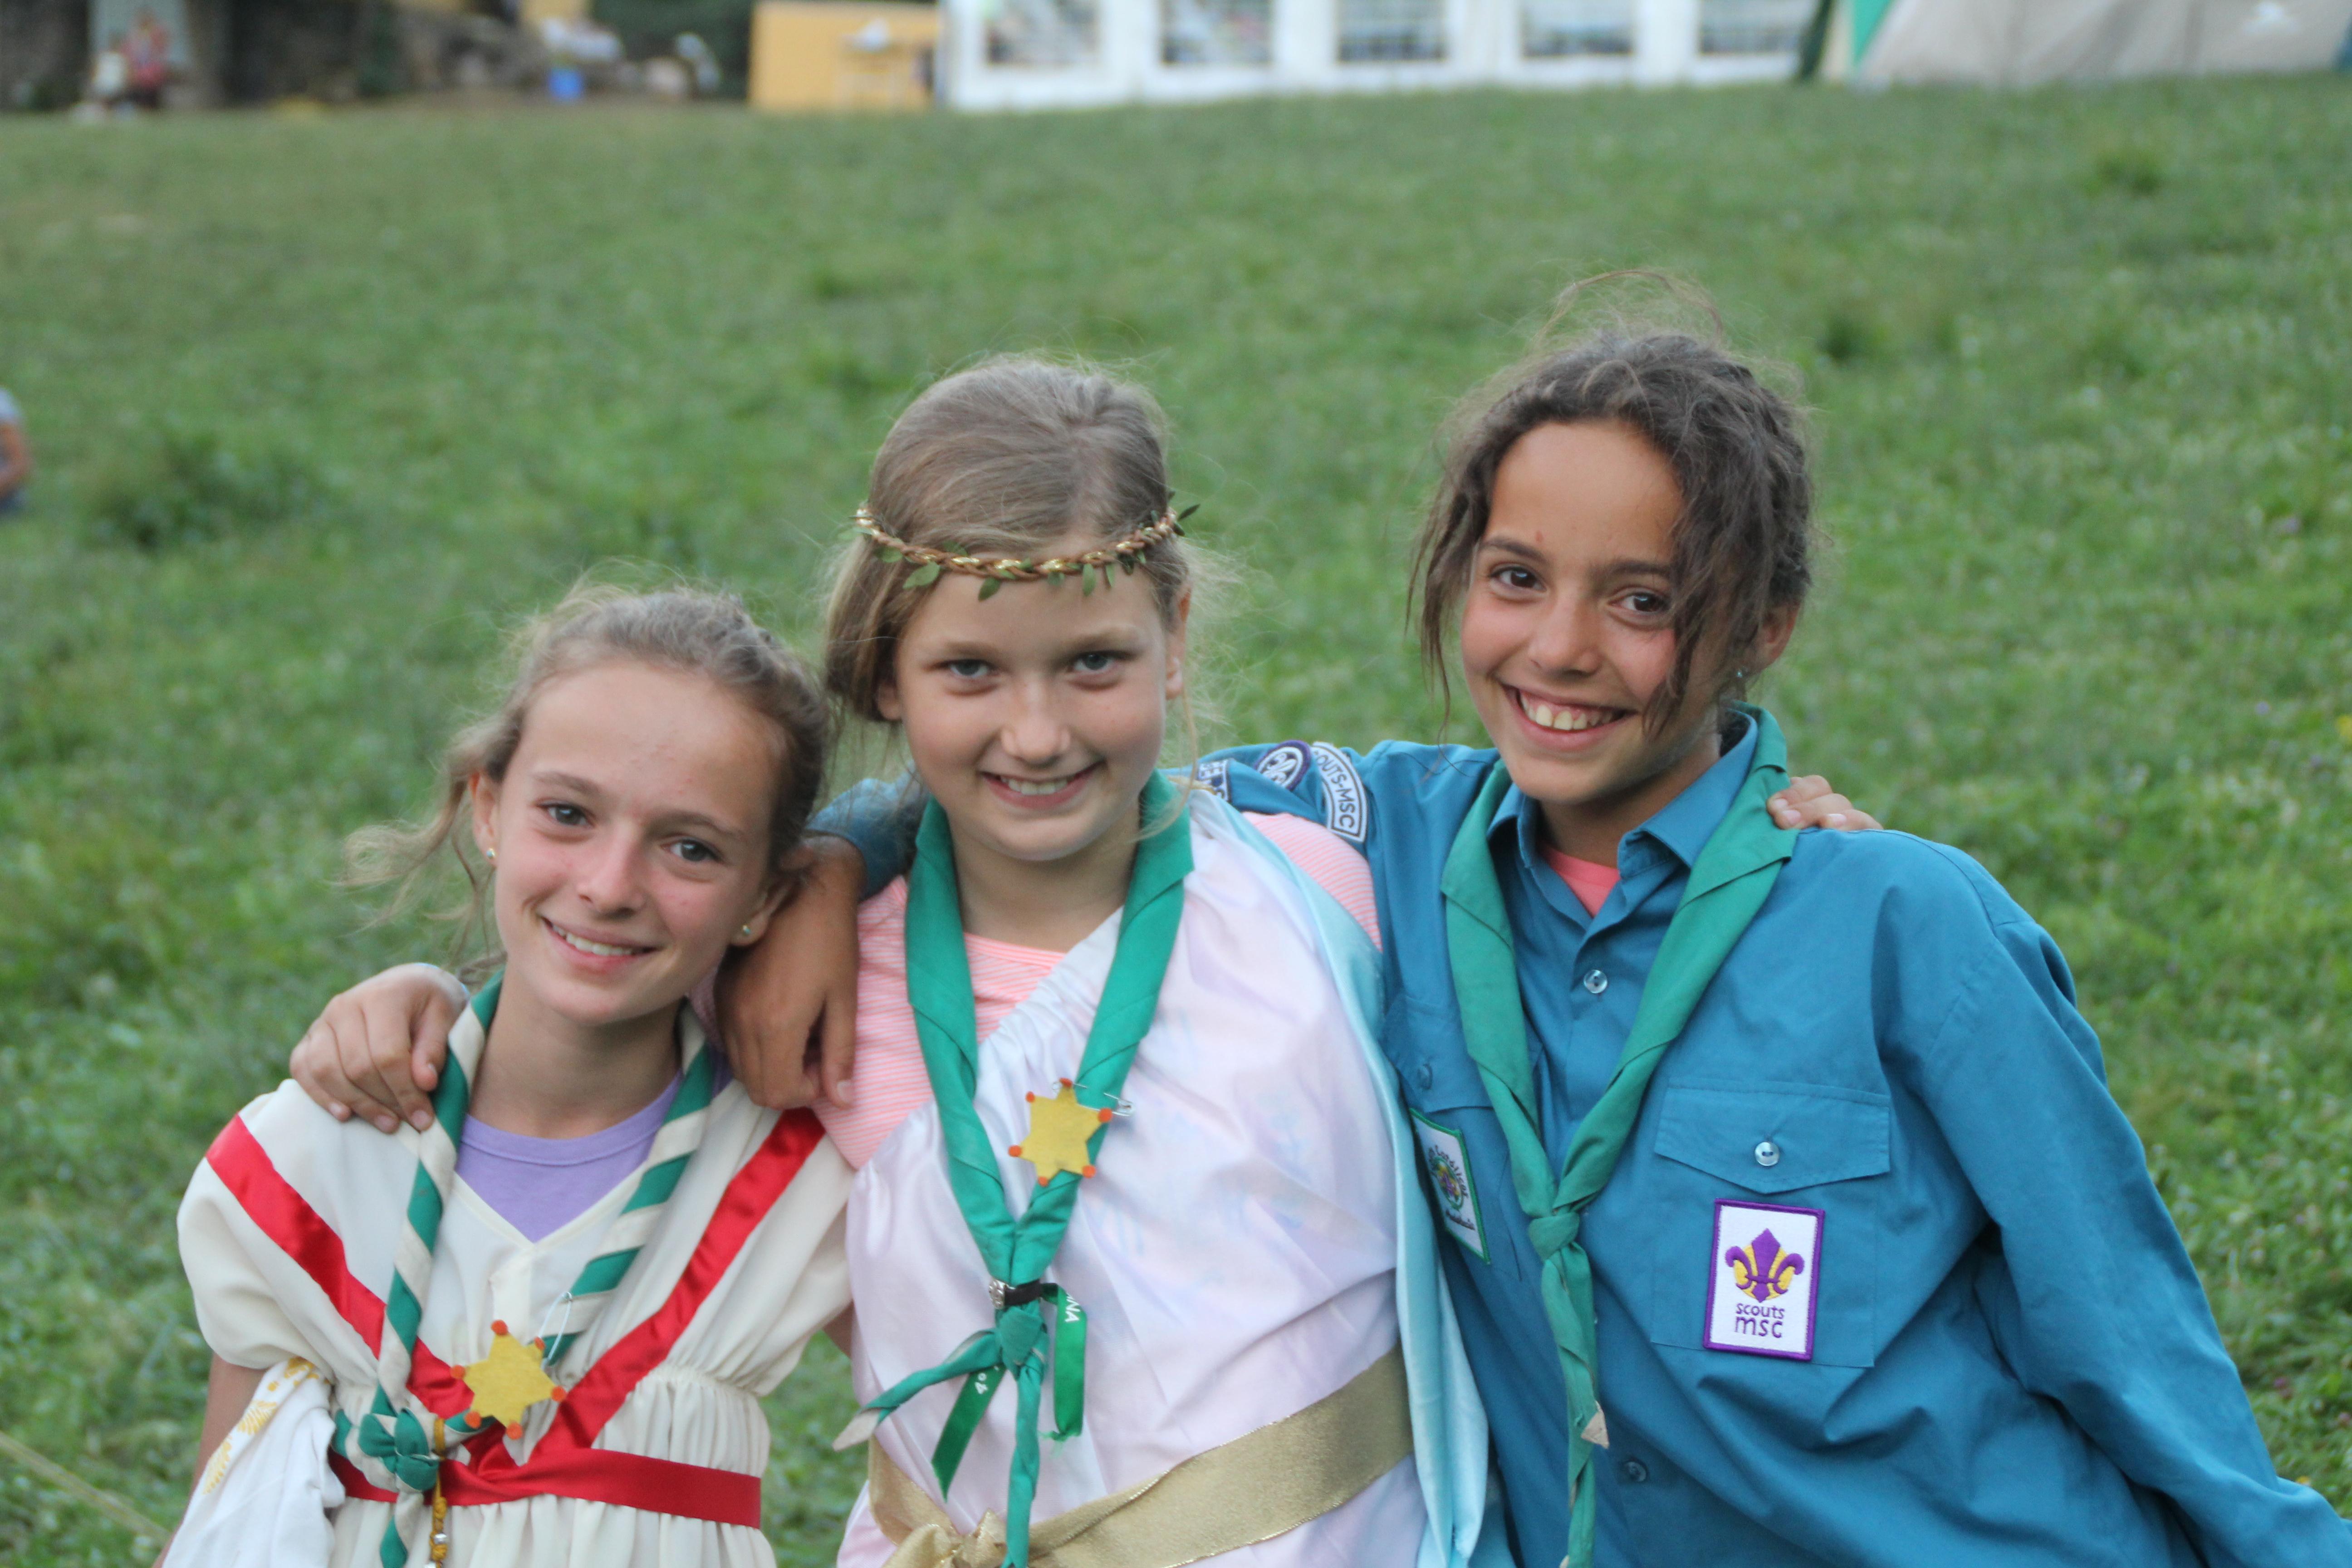 15-16 - Grupo - Campamento de verano - P299